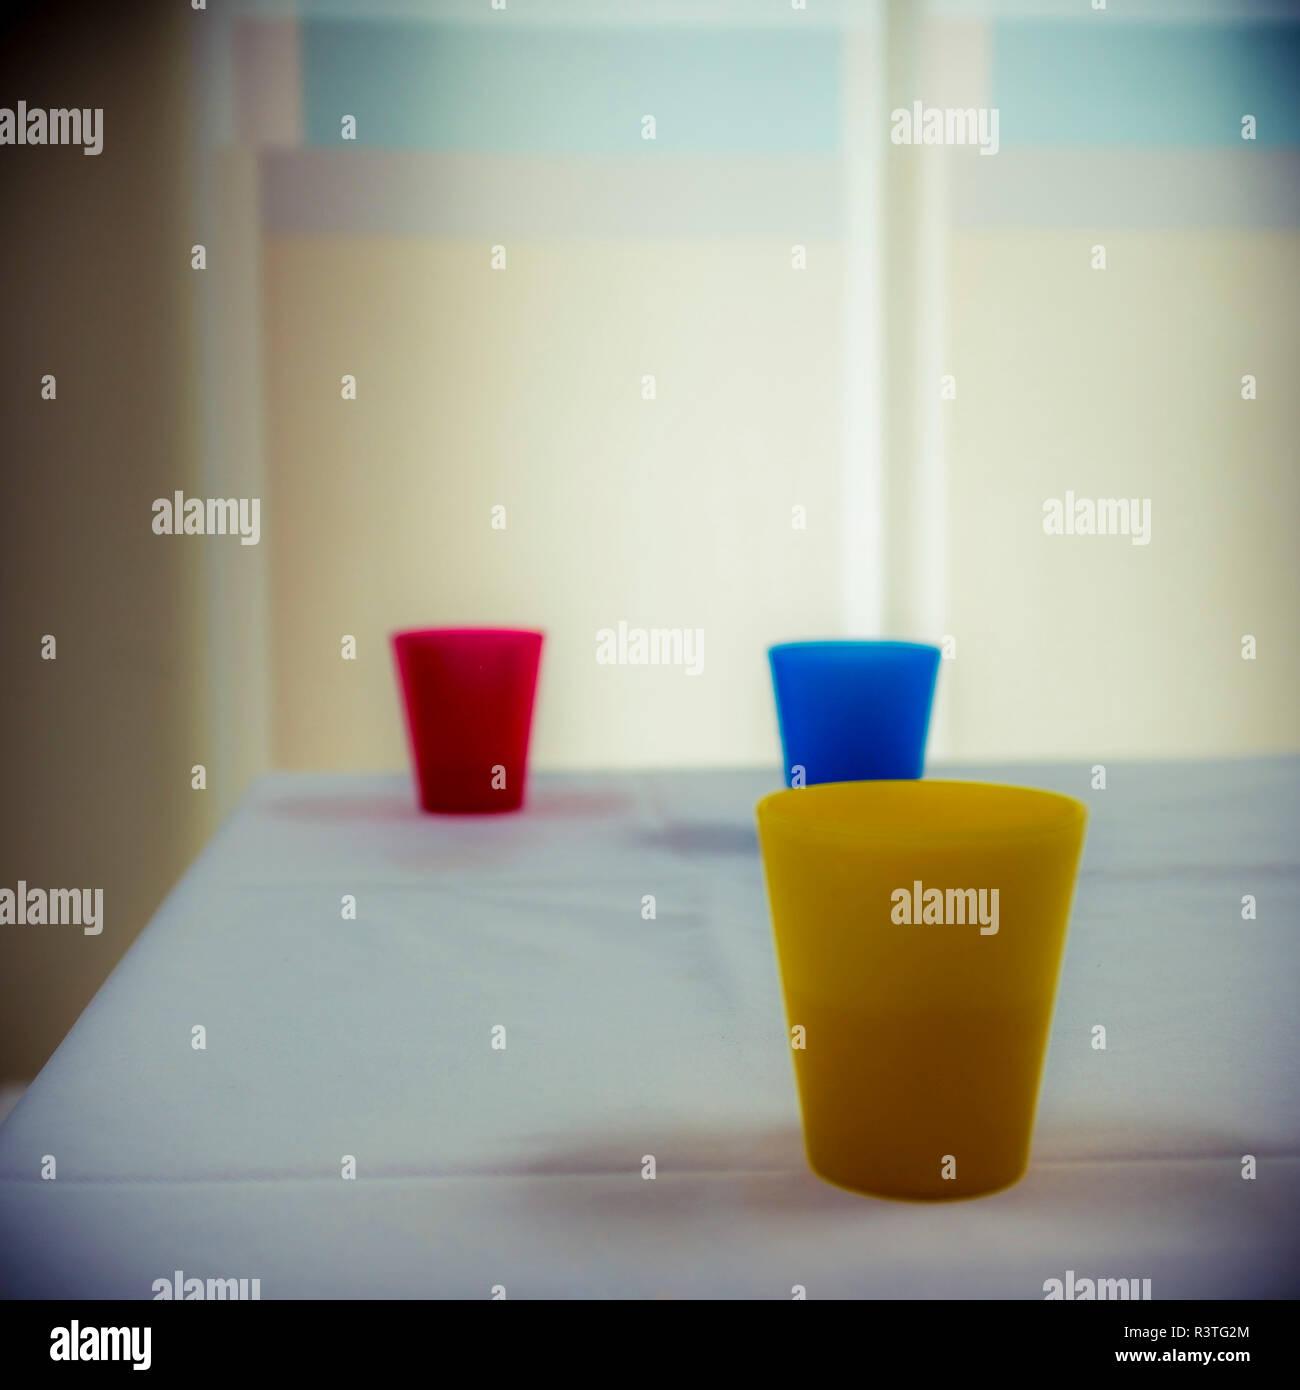 Still life of three plastic cups - Stock Image